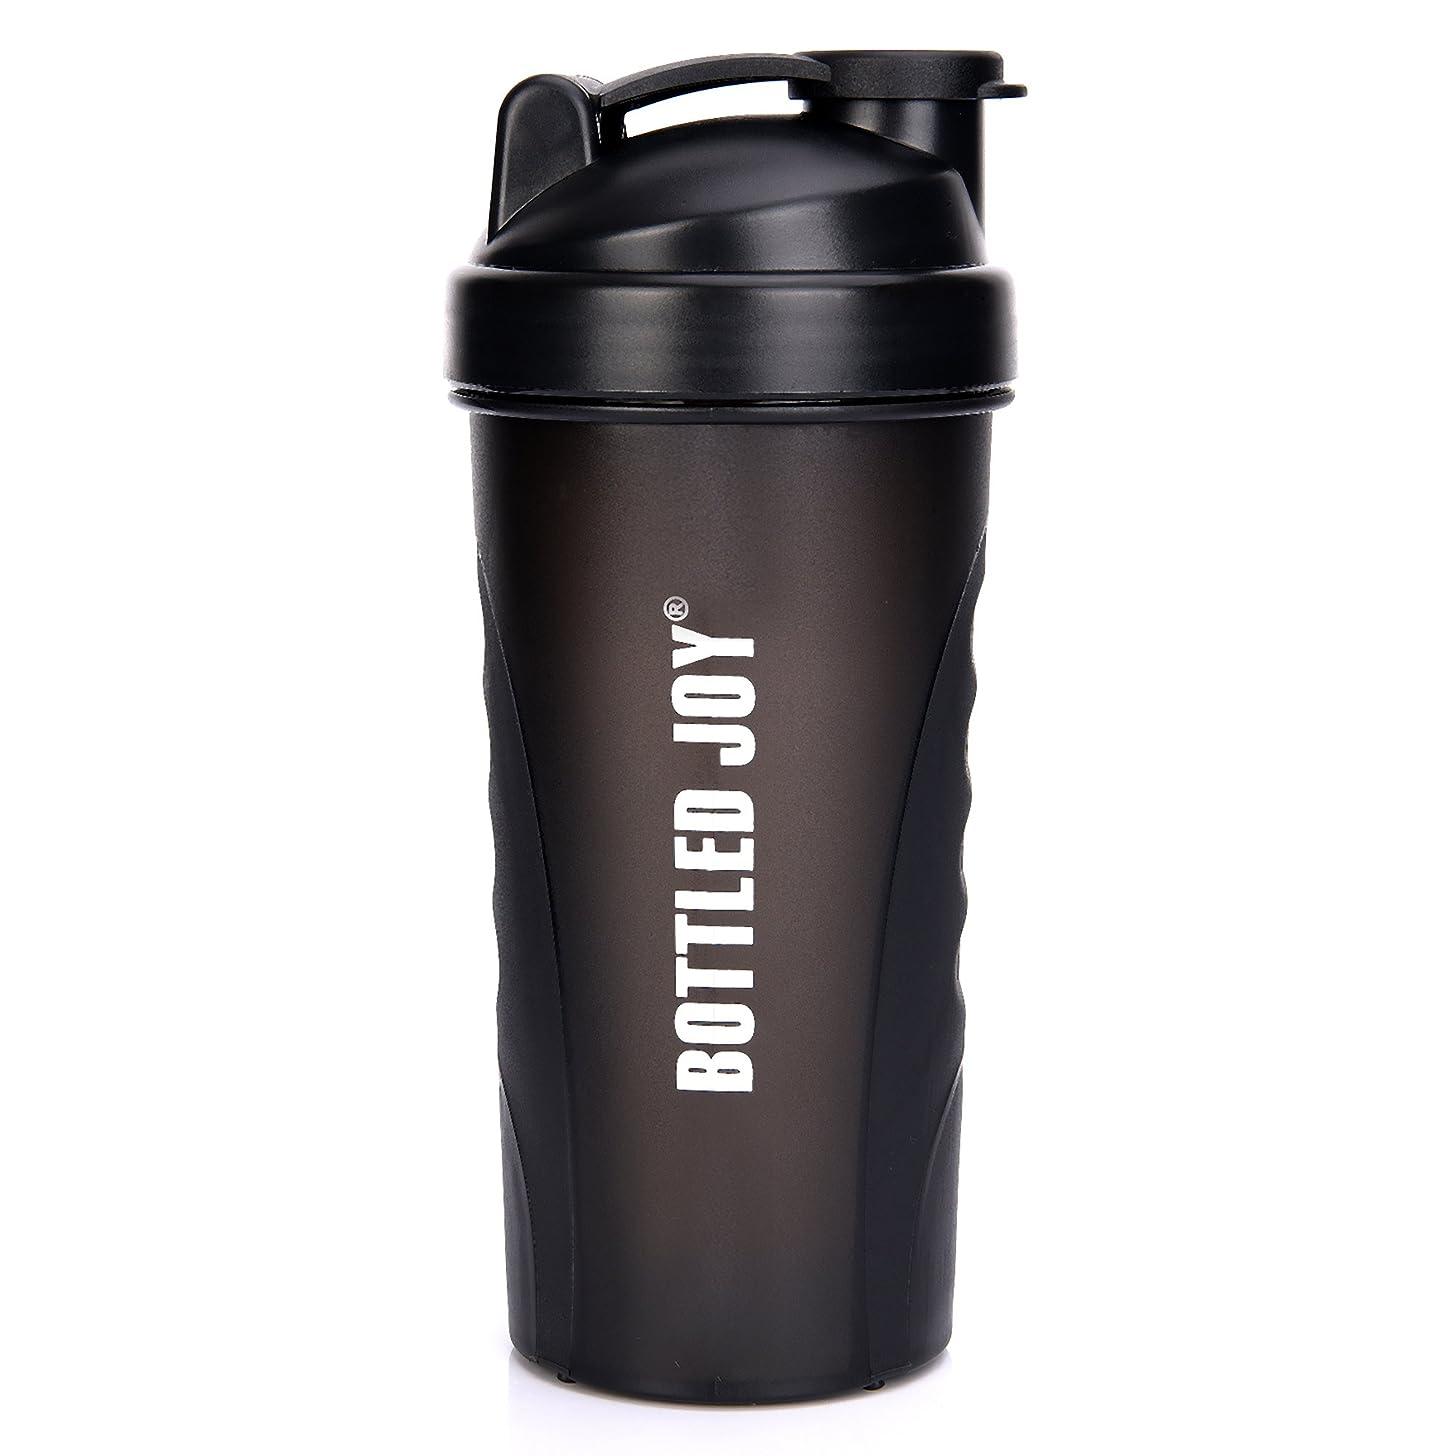 BOTTLED JOY Protein Shaker Bottle, Non-Toxic Wide Mouth 100% Leak Proof Shake Water Bottles 27oz 800ml (Black)